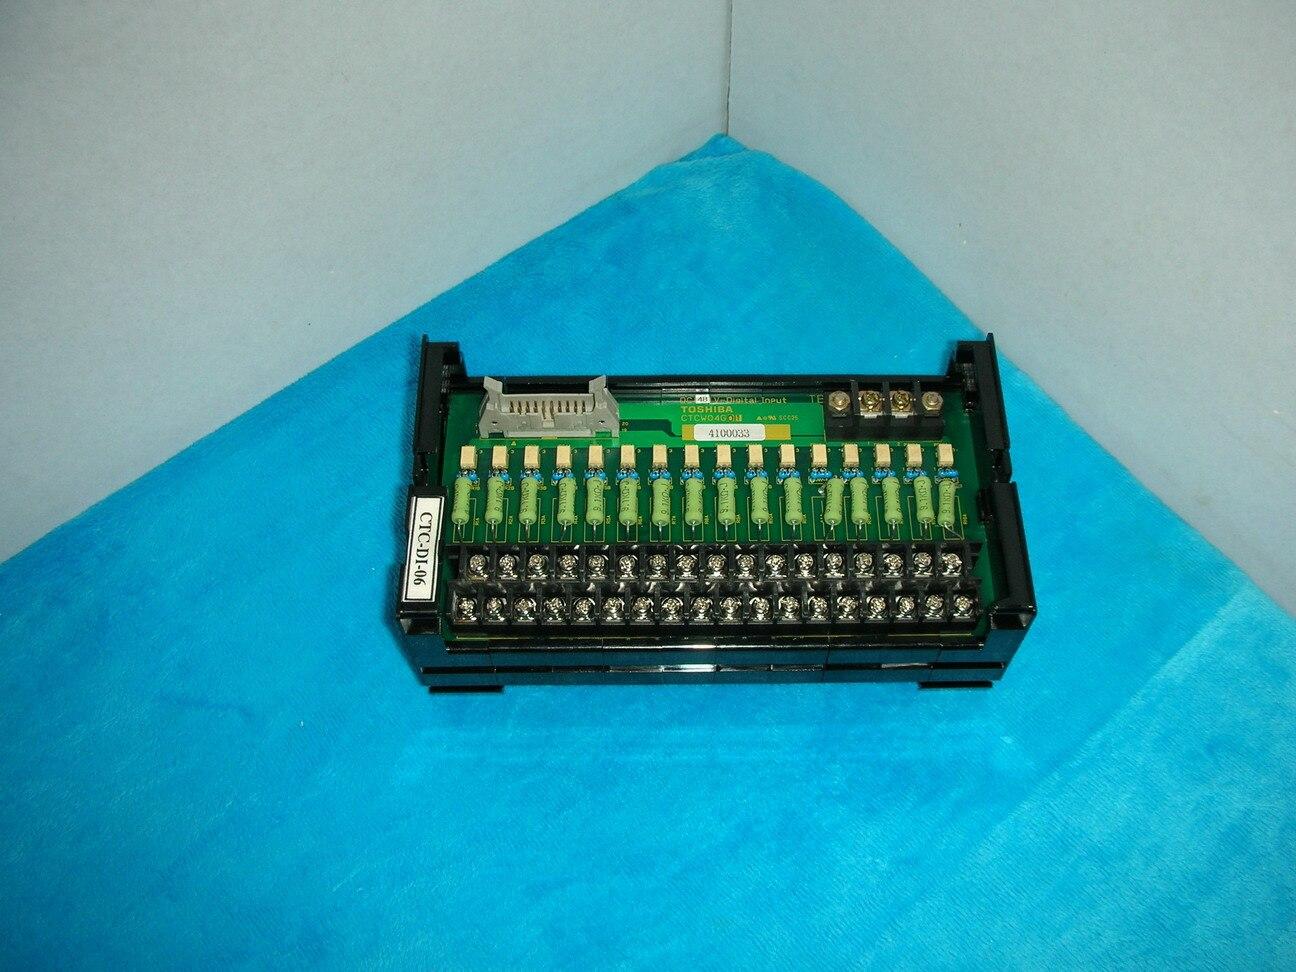 1 PC USATO TOSHIBA PCL-A95W/CTCW04G011 PC USATO TOSHIBA PCL-A95W/CTCW04G01